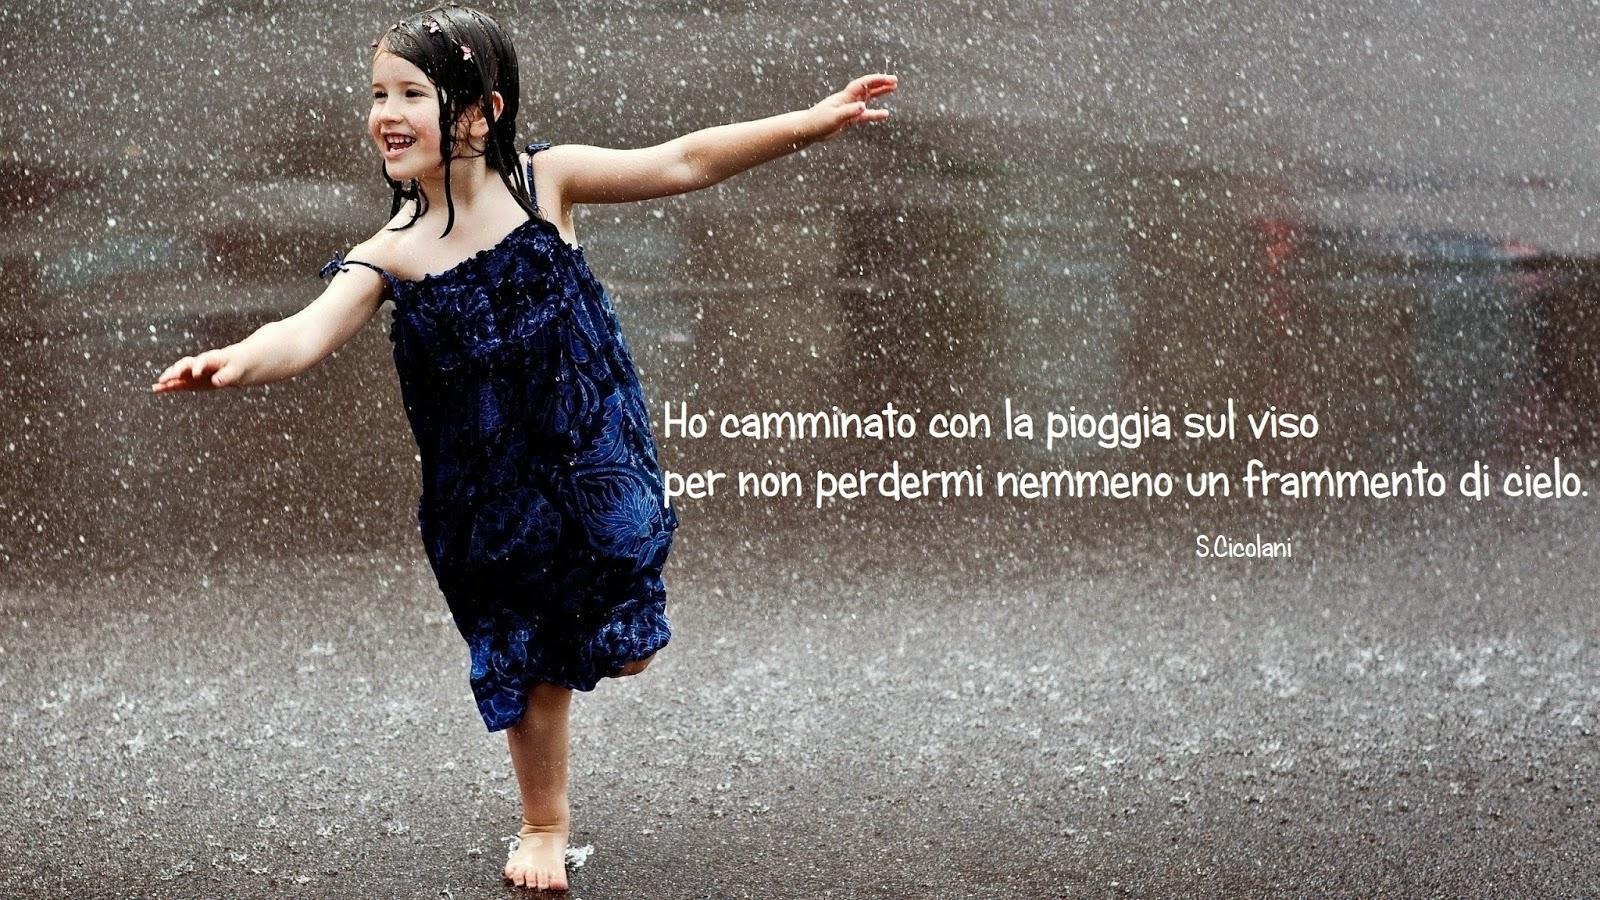 Top Frasi Sulla Pioggia ML82 » Regardsdefemmes FY82